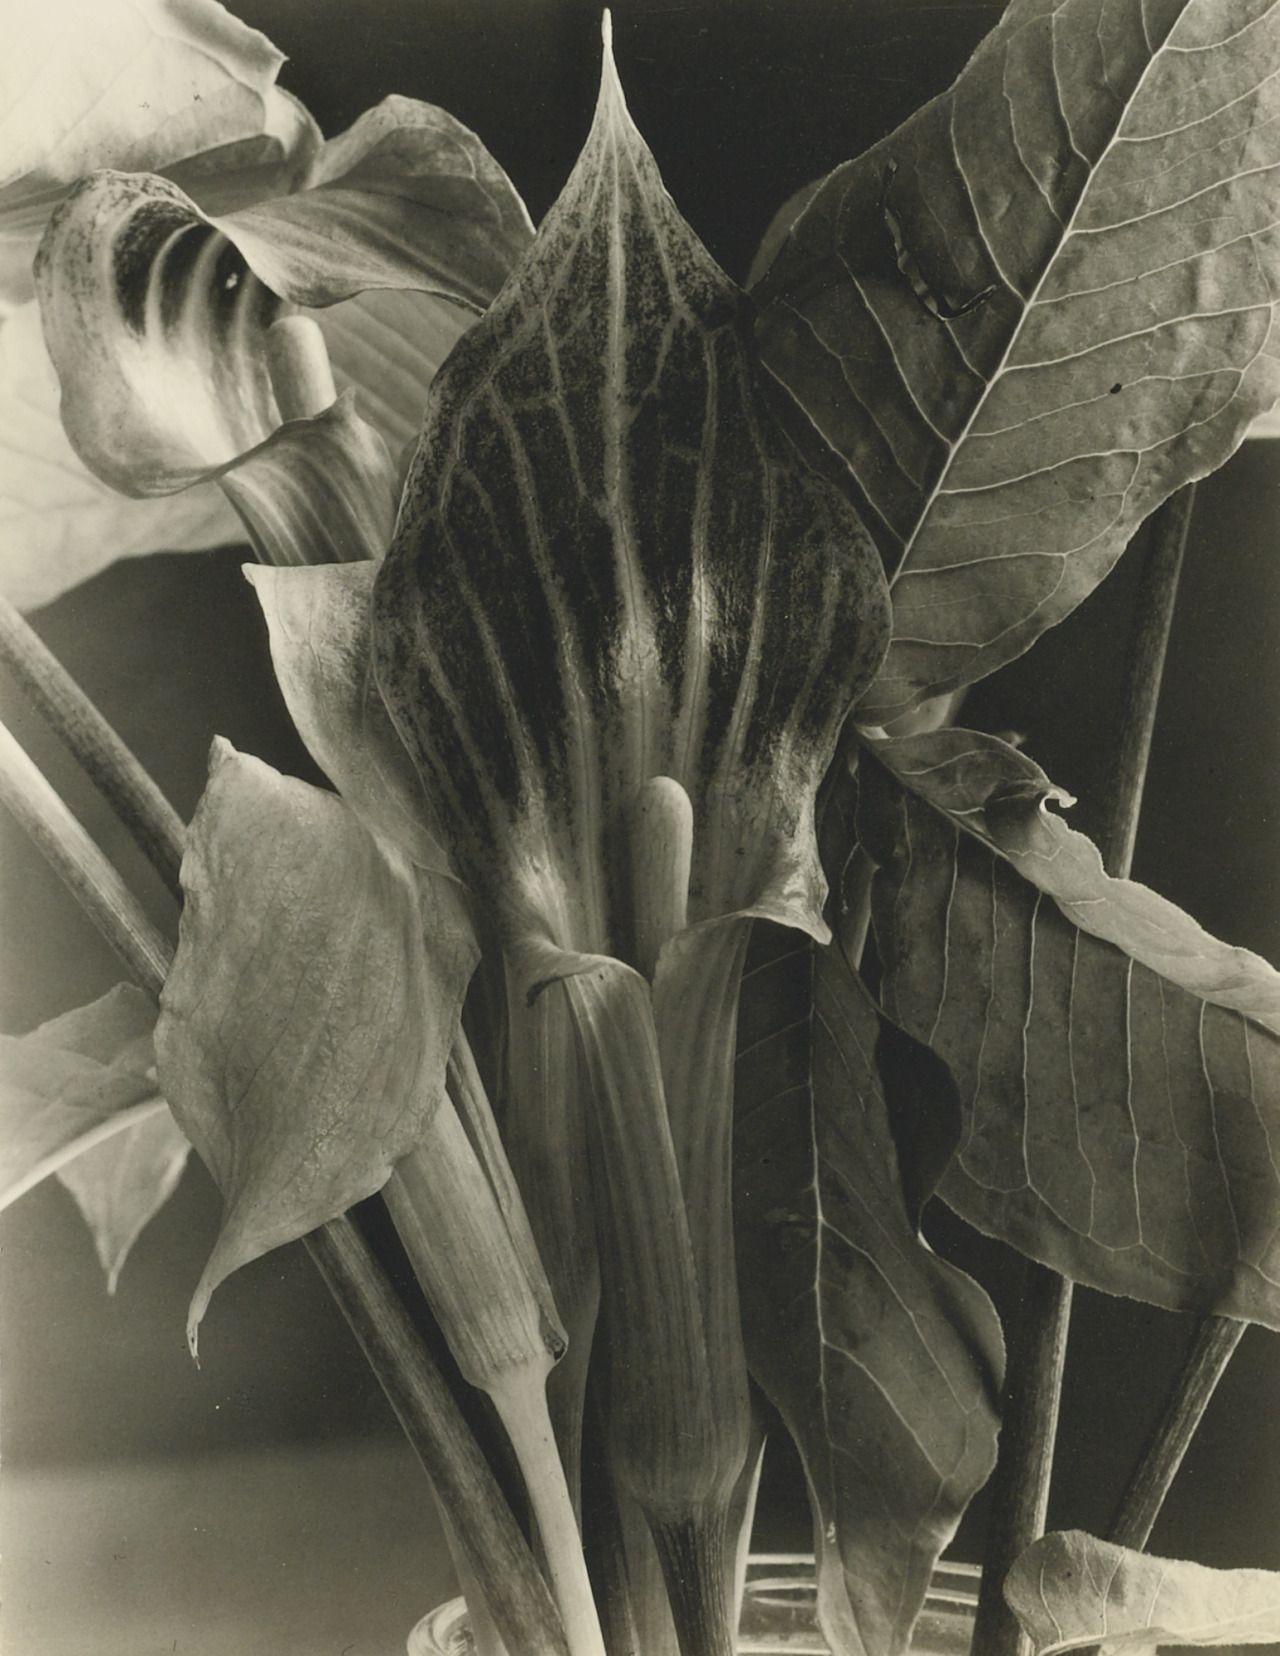 Imogen Cunningham - Jack-in-the-pulpit, 1934.